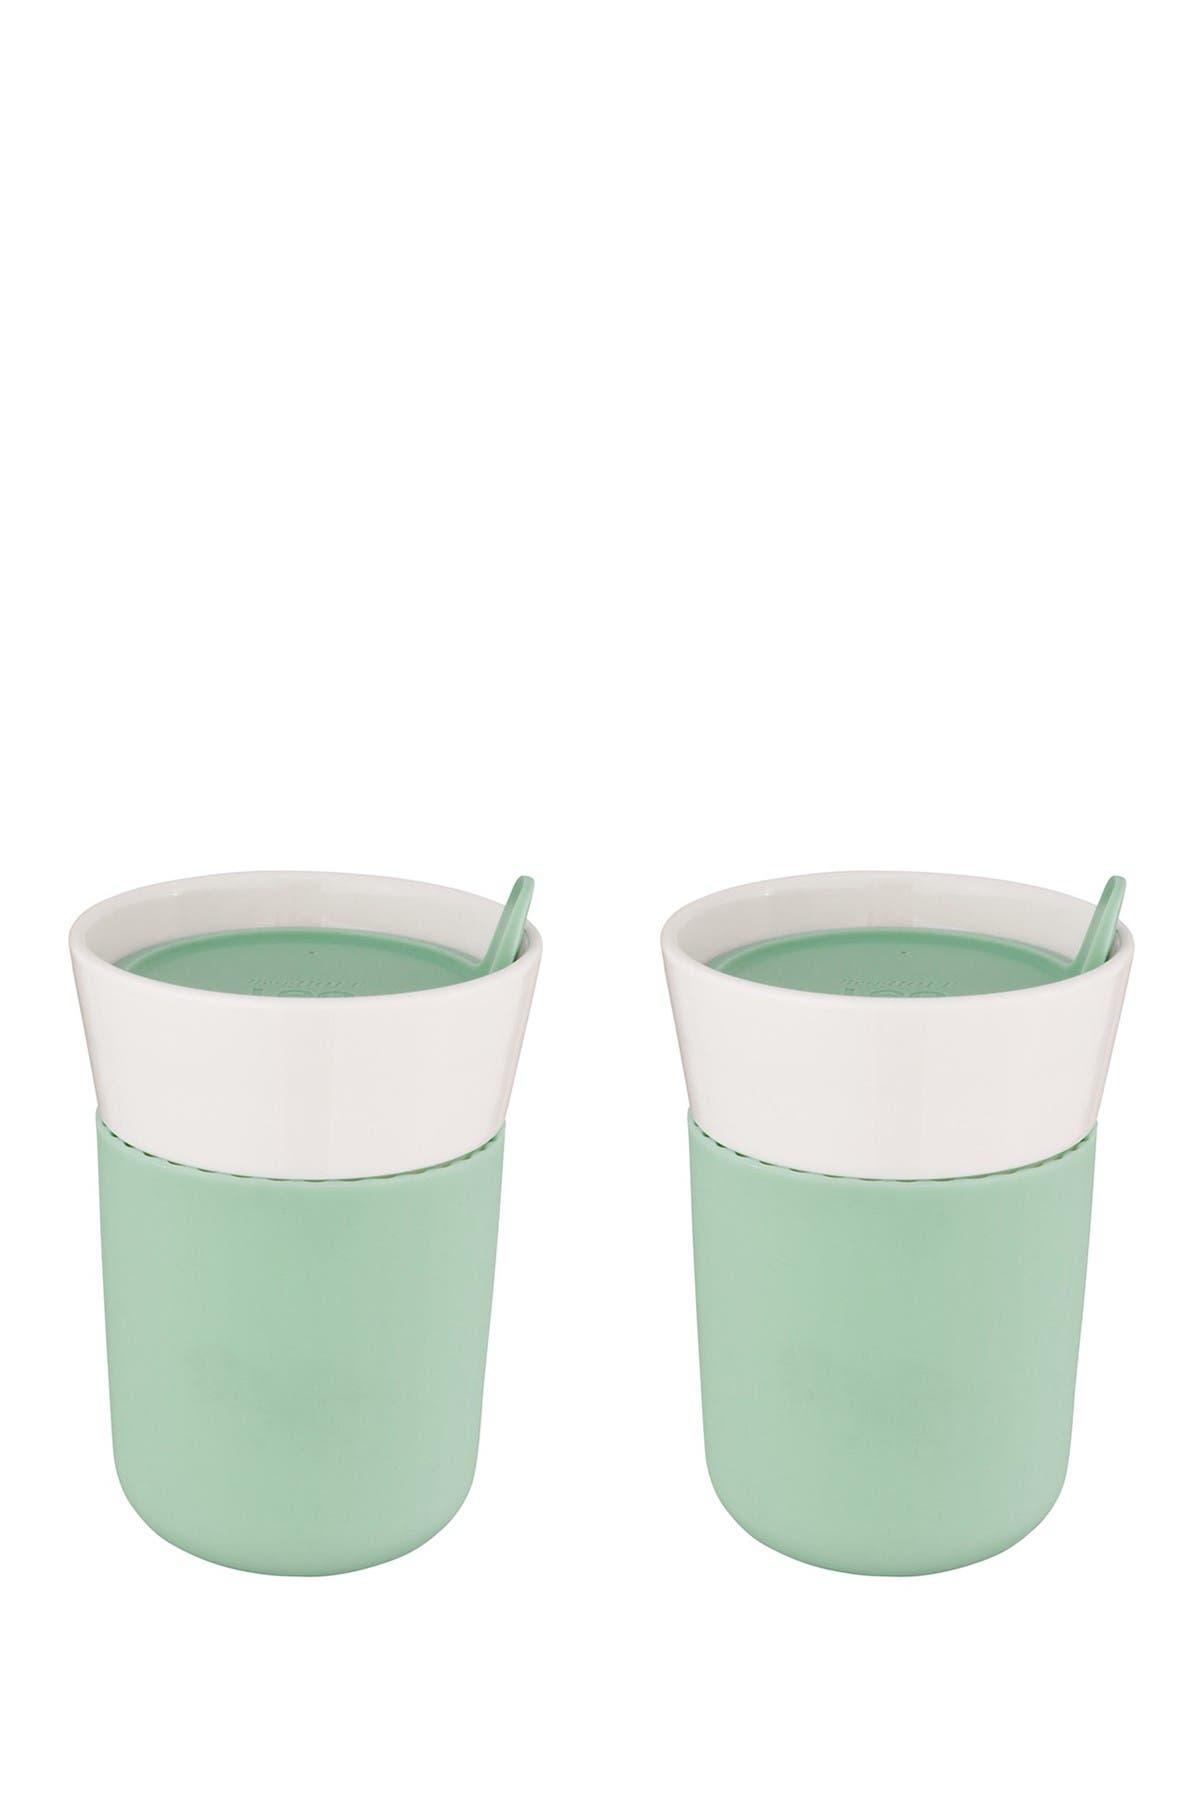 Image of BergHOFF Leo Green Porcelain Travel Mug - Set of 2